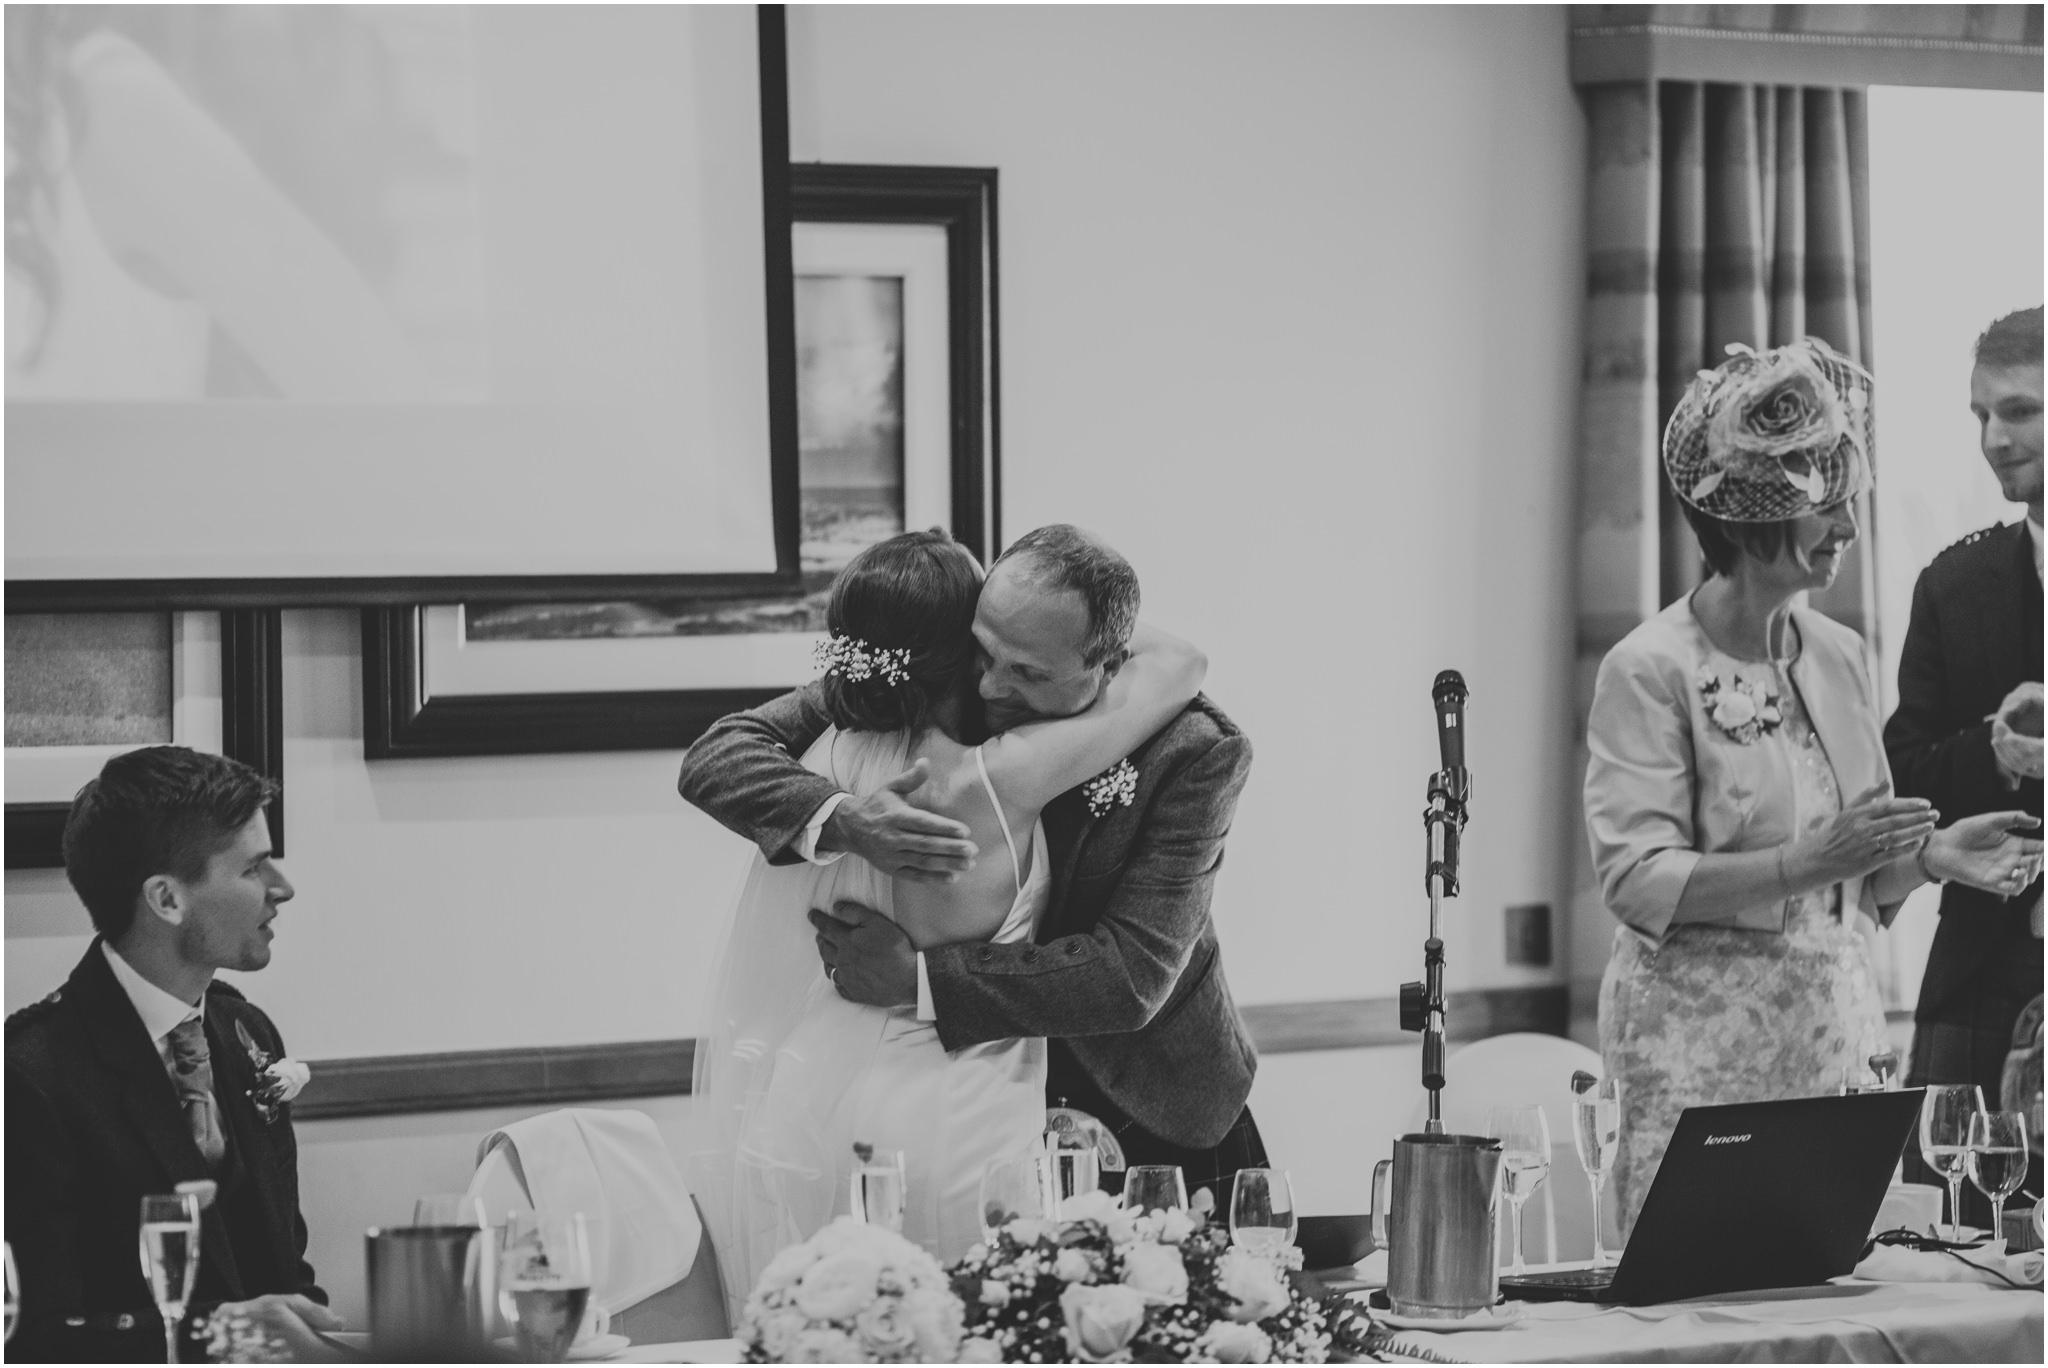 Photography 78 - Glasgow Wedding Photographer - Jordan & Abi - The Waterside Hotel, West Kilbride_0111.jpg